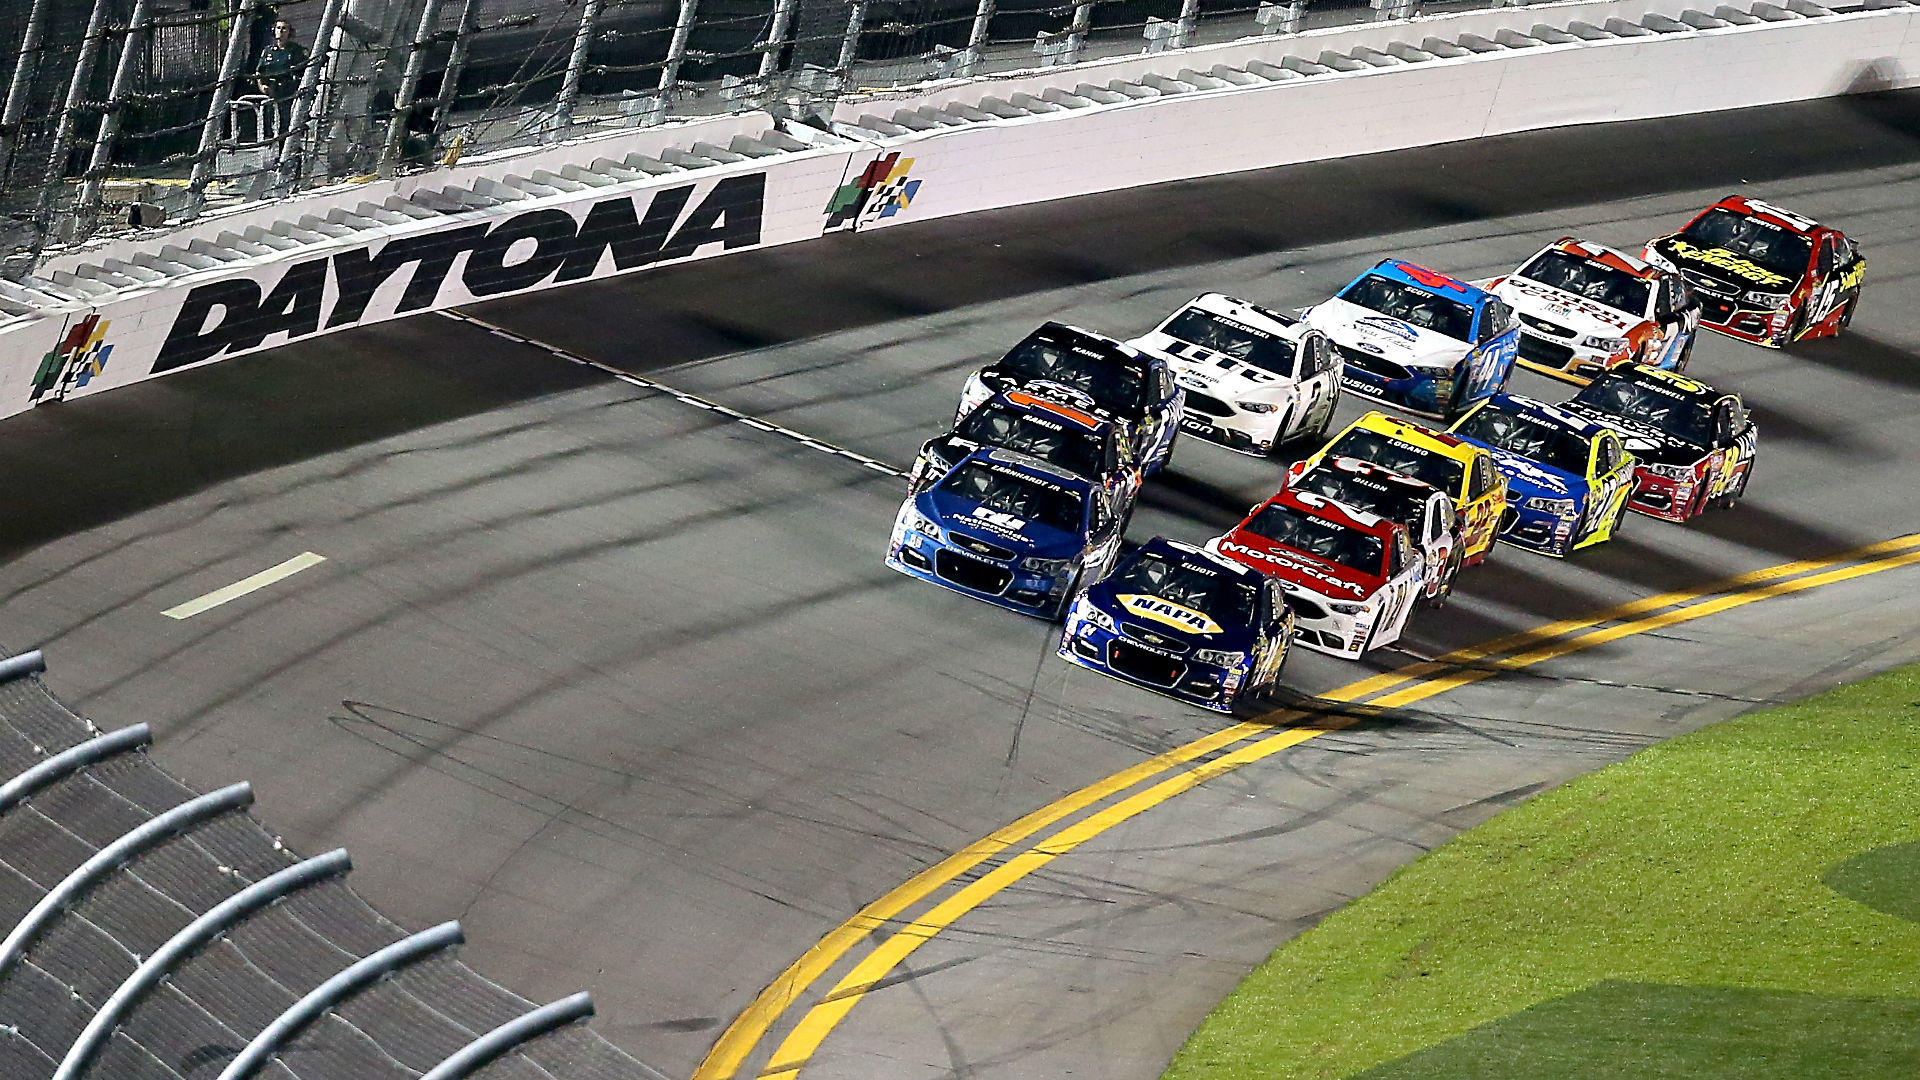 Starting lineup for 58th Daytona 500 | NASCAR | Sporting News